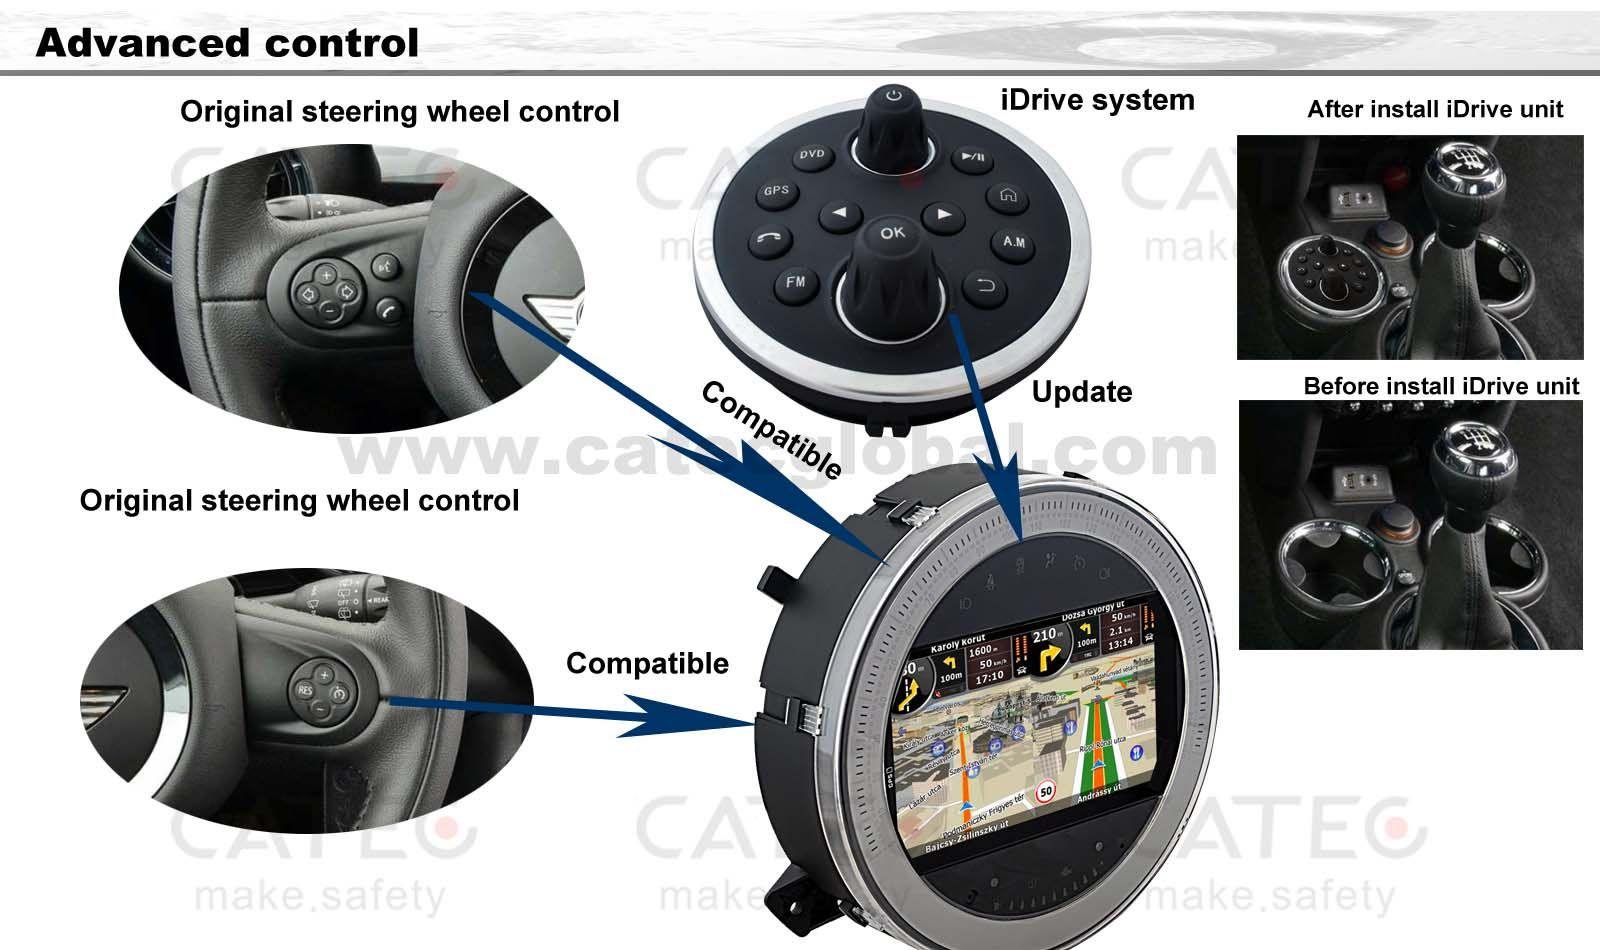 idrive advanced control for mini cooper car gps navigation. Black Bedroom Furniture Sets. Home Design Ideas